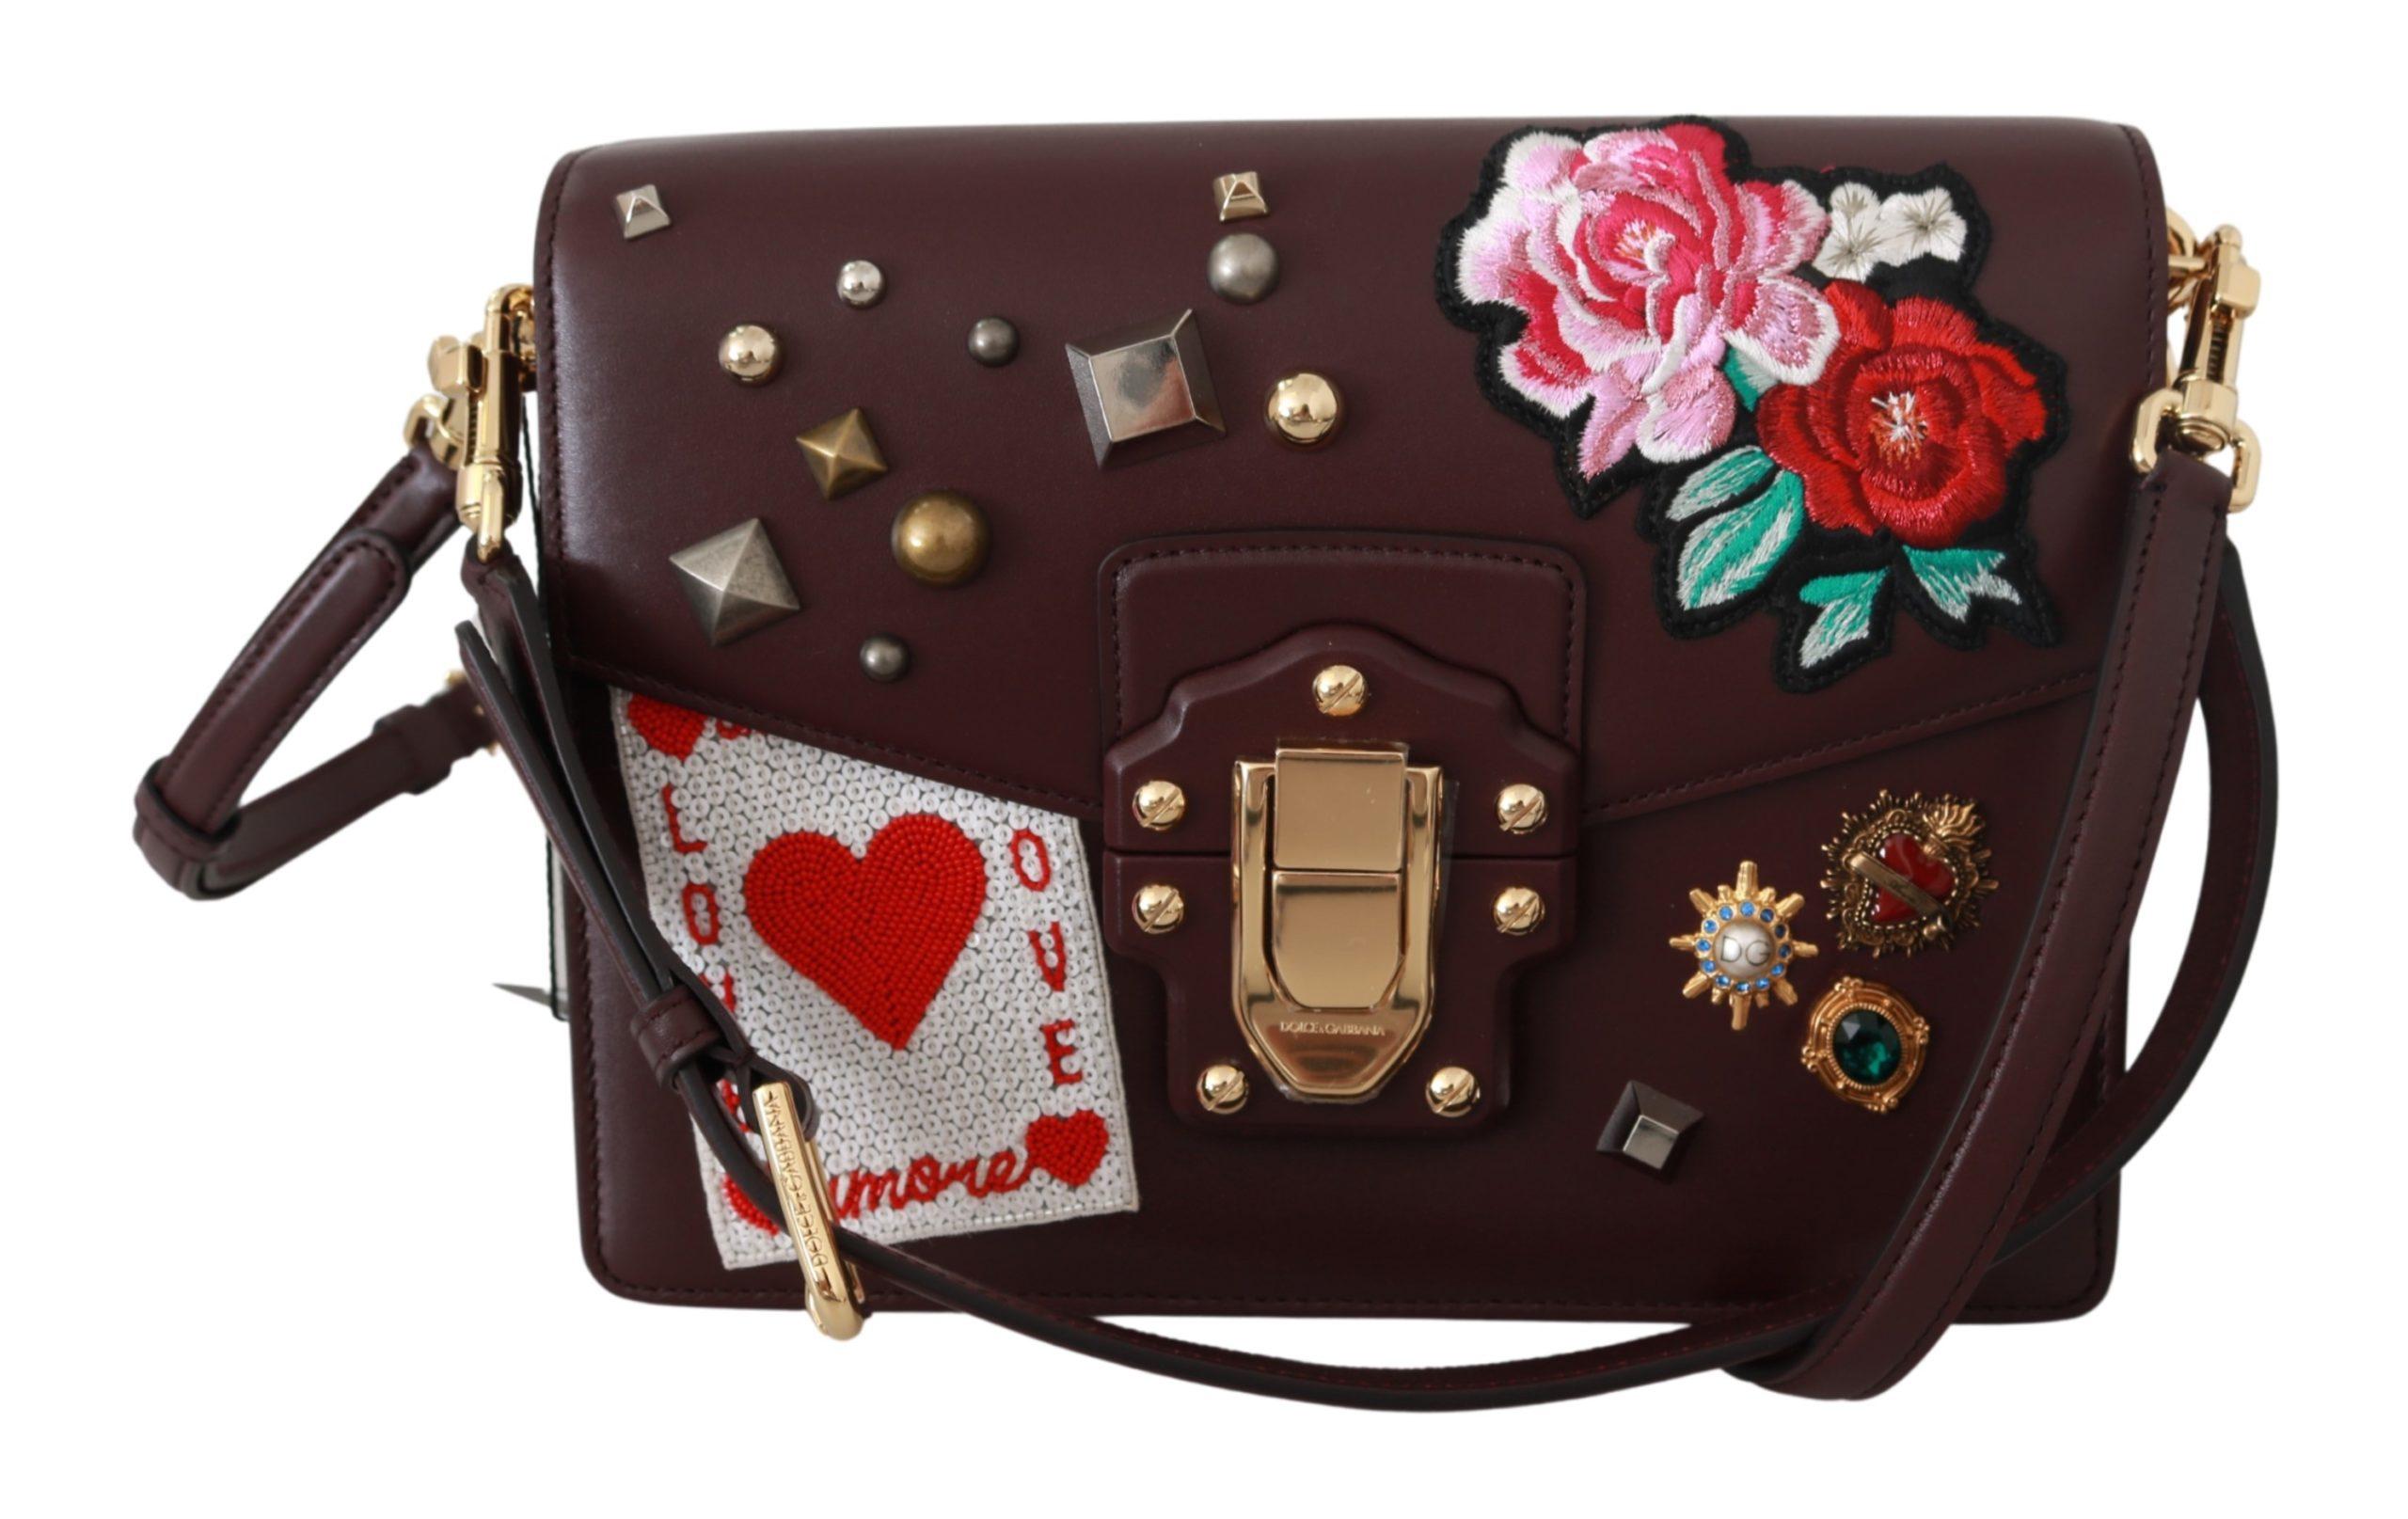 Dolce & Gabbana Women's LUCIA Leather Shoulder Bag Black VAS9241